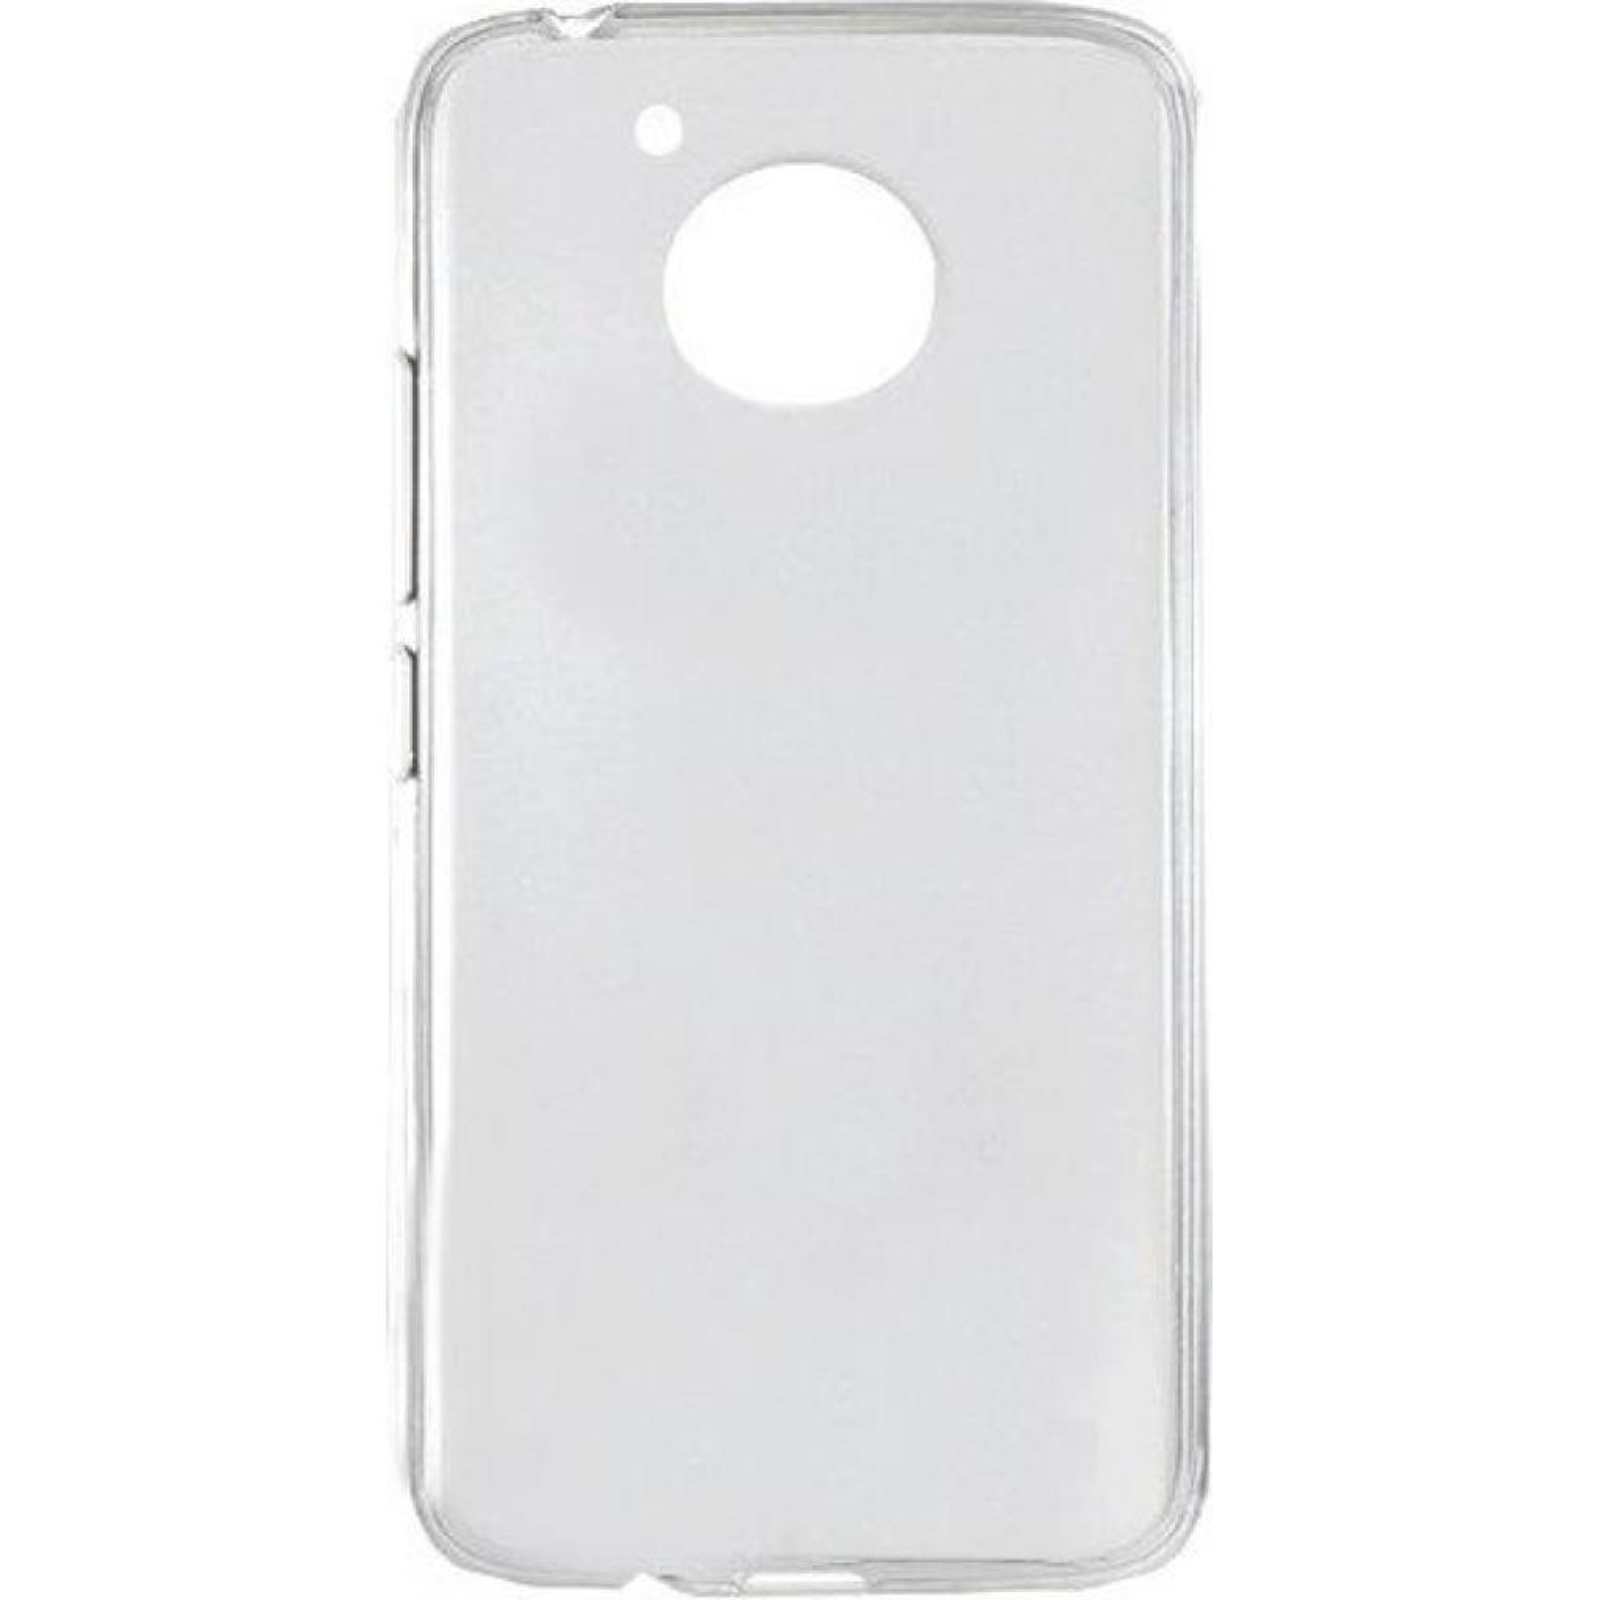 Чехол для моб. телефона Colorway TPU case for Motorola MOTO G5 (XT1676) (CW-CTBMMG5)